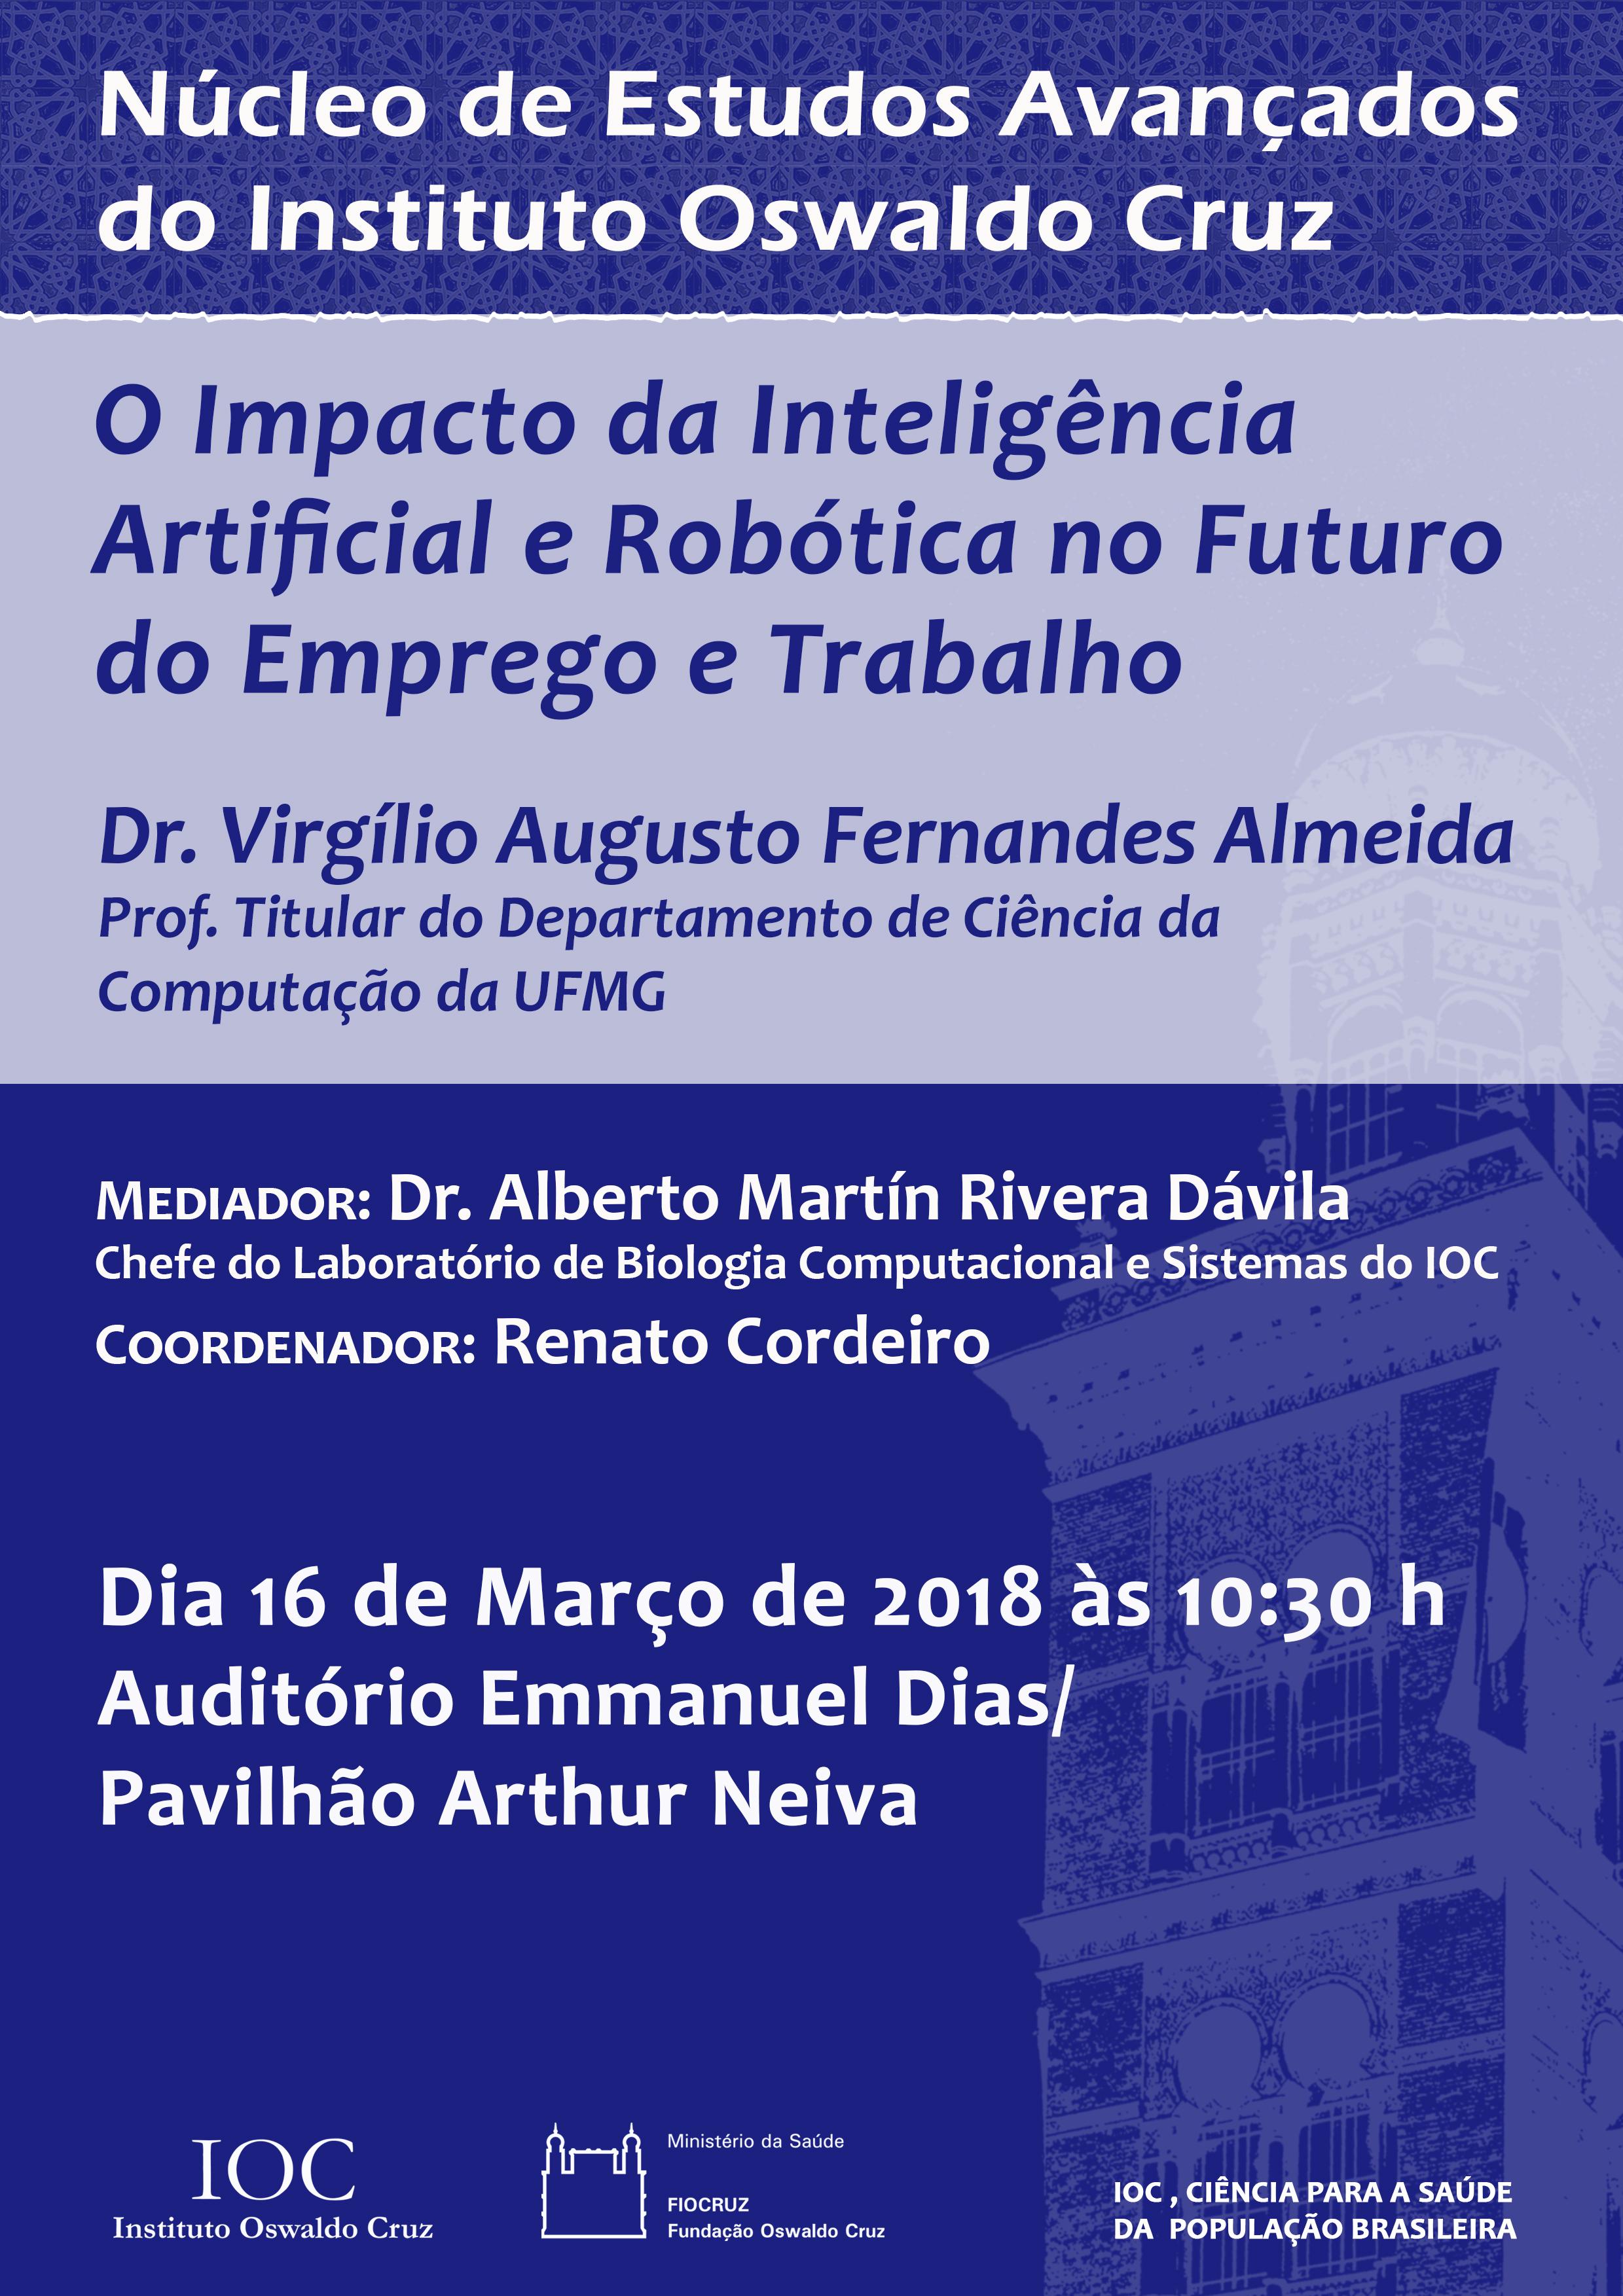 nucleo_estudos_avancados_ioc_inteligencia_artificial_16_marco_2018.jpg